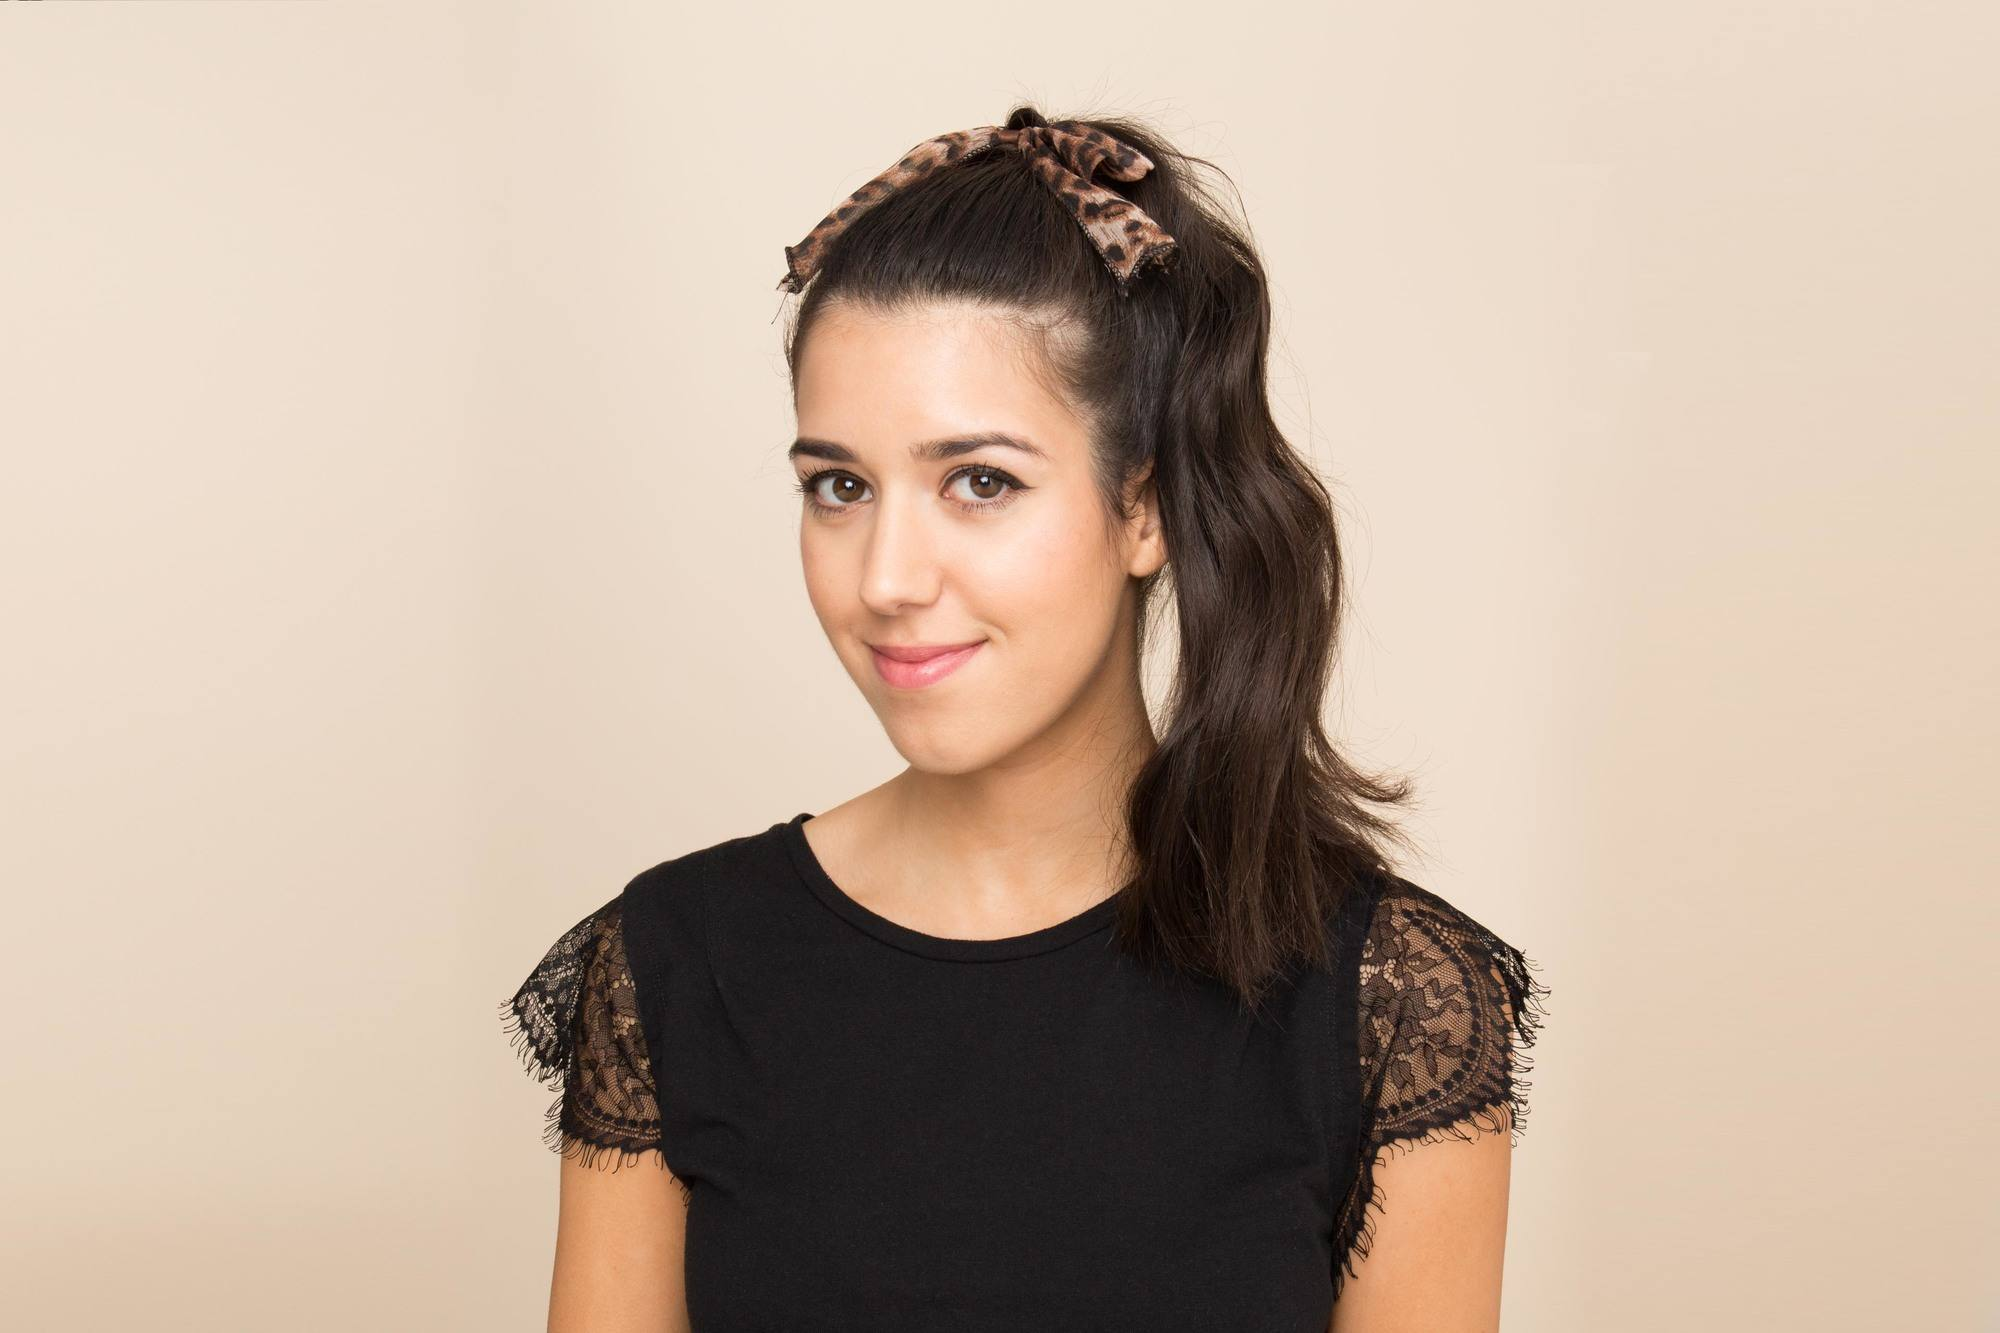 model rambut panjang bergelombang gaya side ponytail